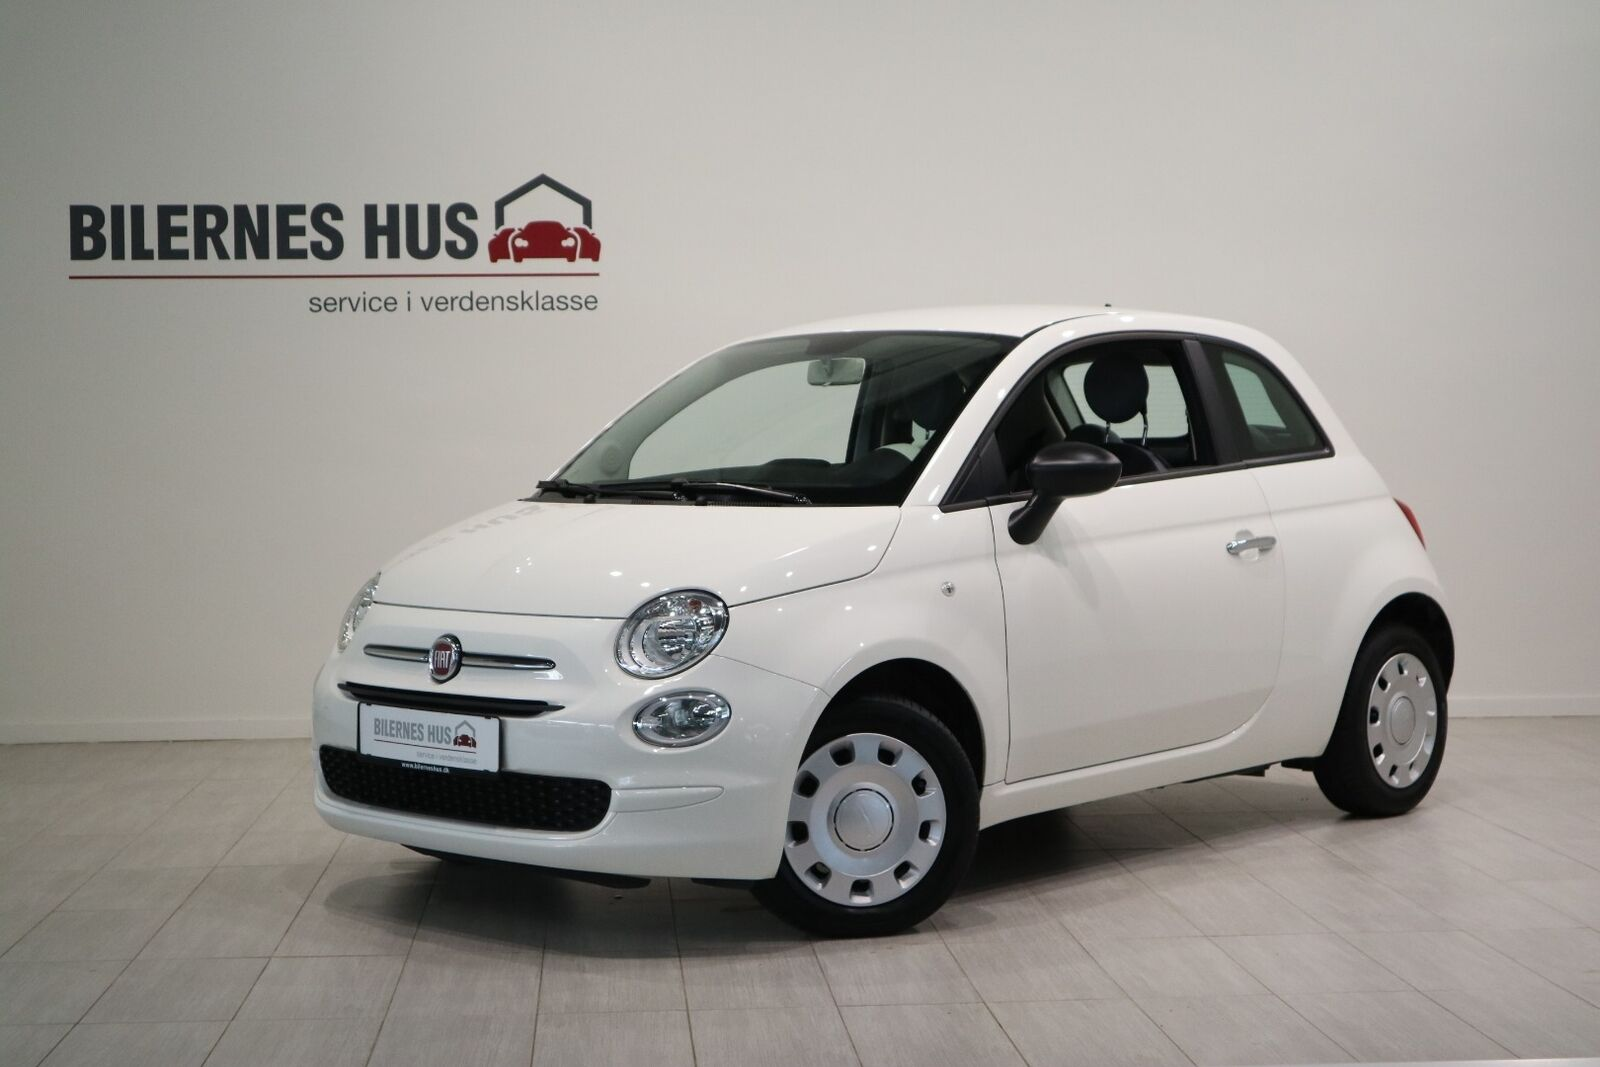 Fiat 500 Billede 6